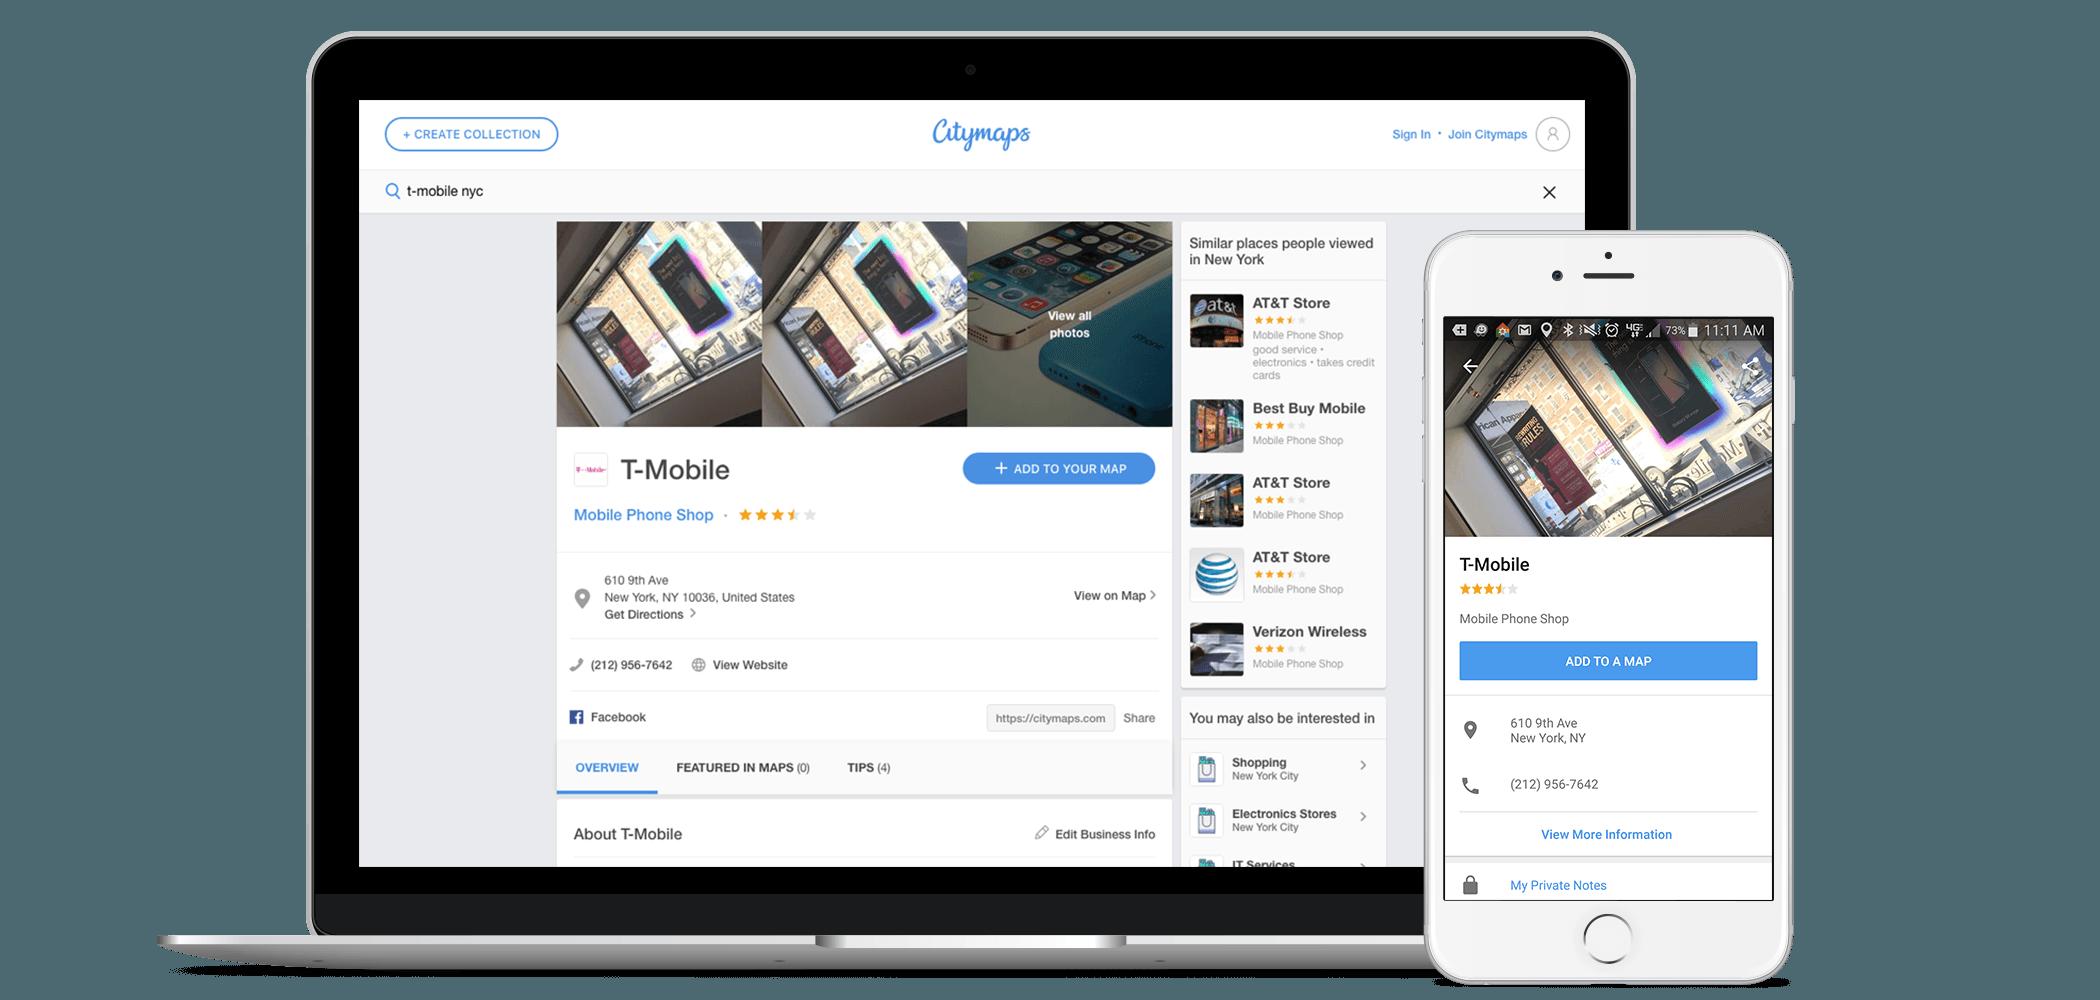 products-listings-Citymaps-hero